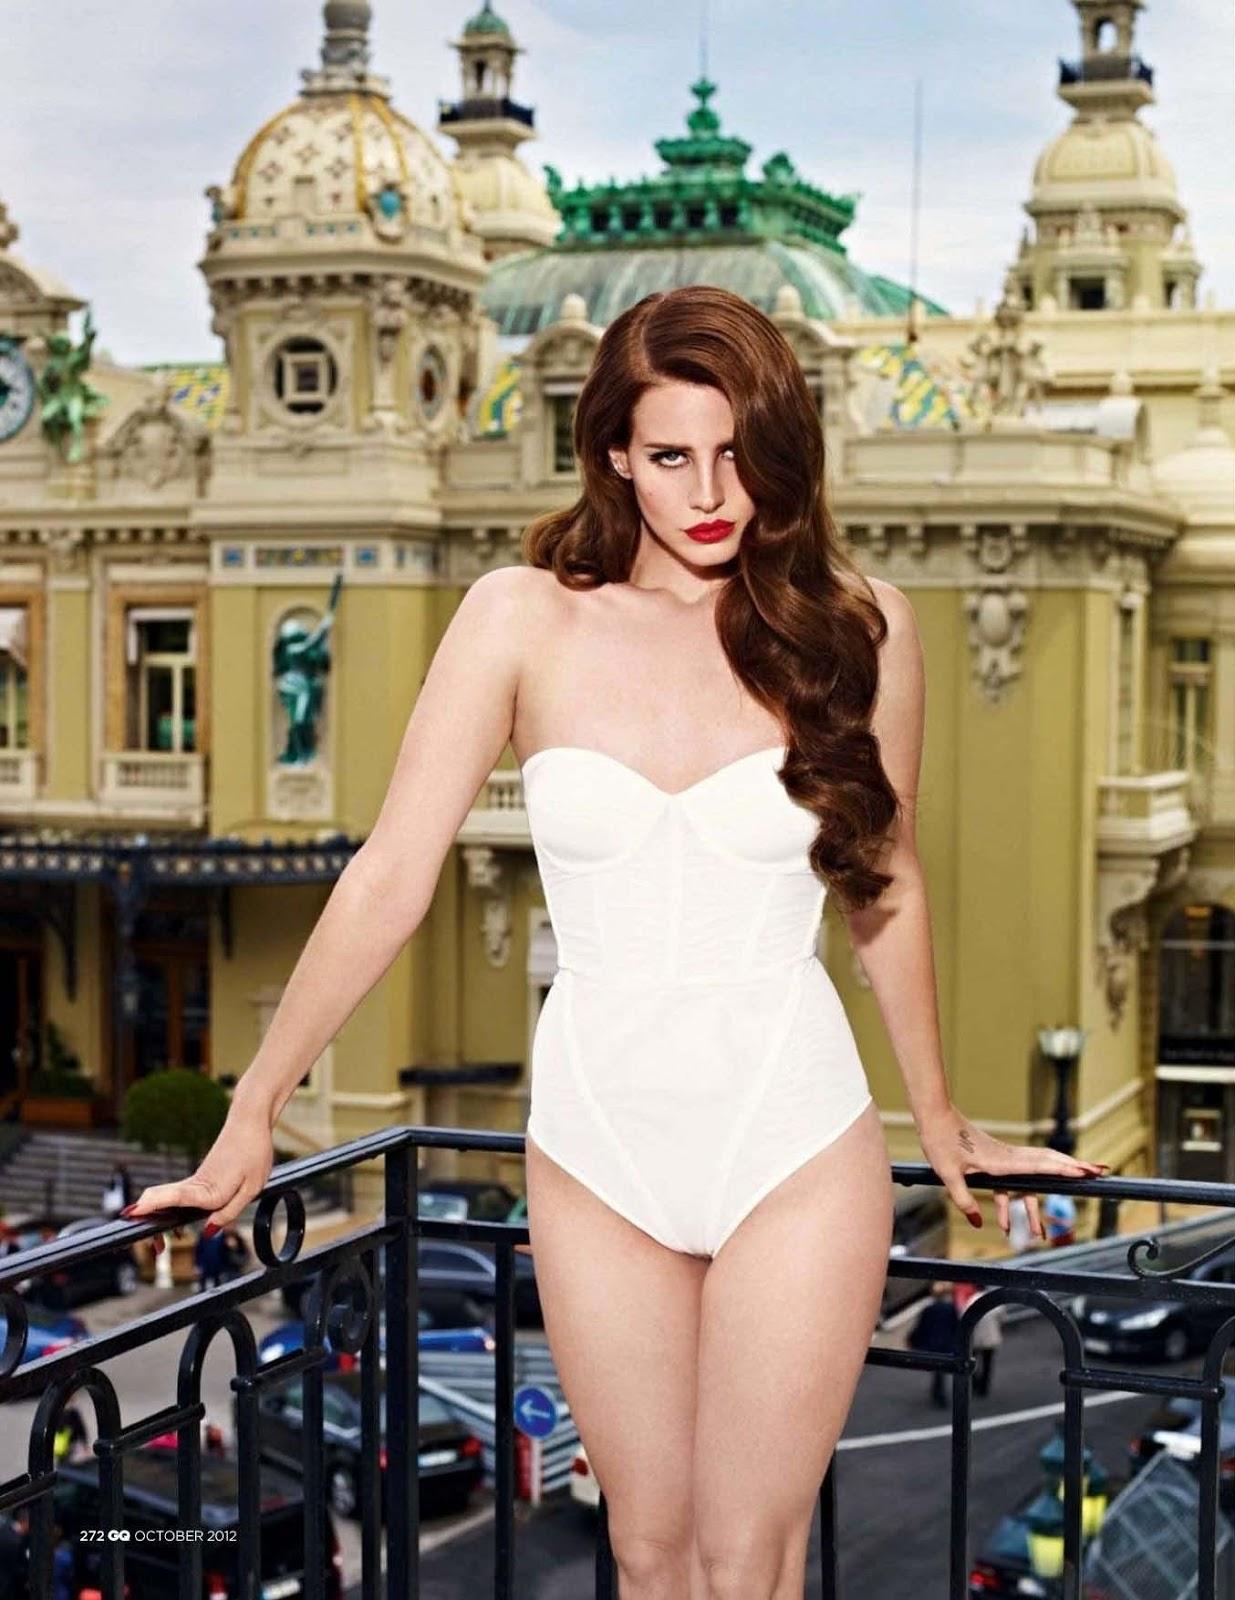 Lana Del Rey By Chris Nicholls For Fashion Magazine: R2D3 Celebscon